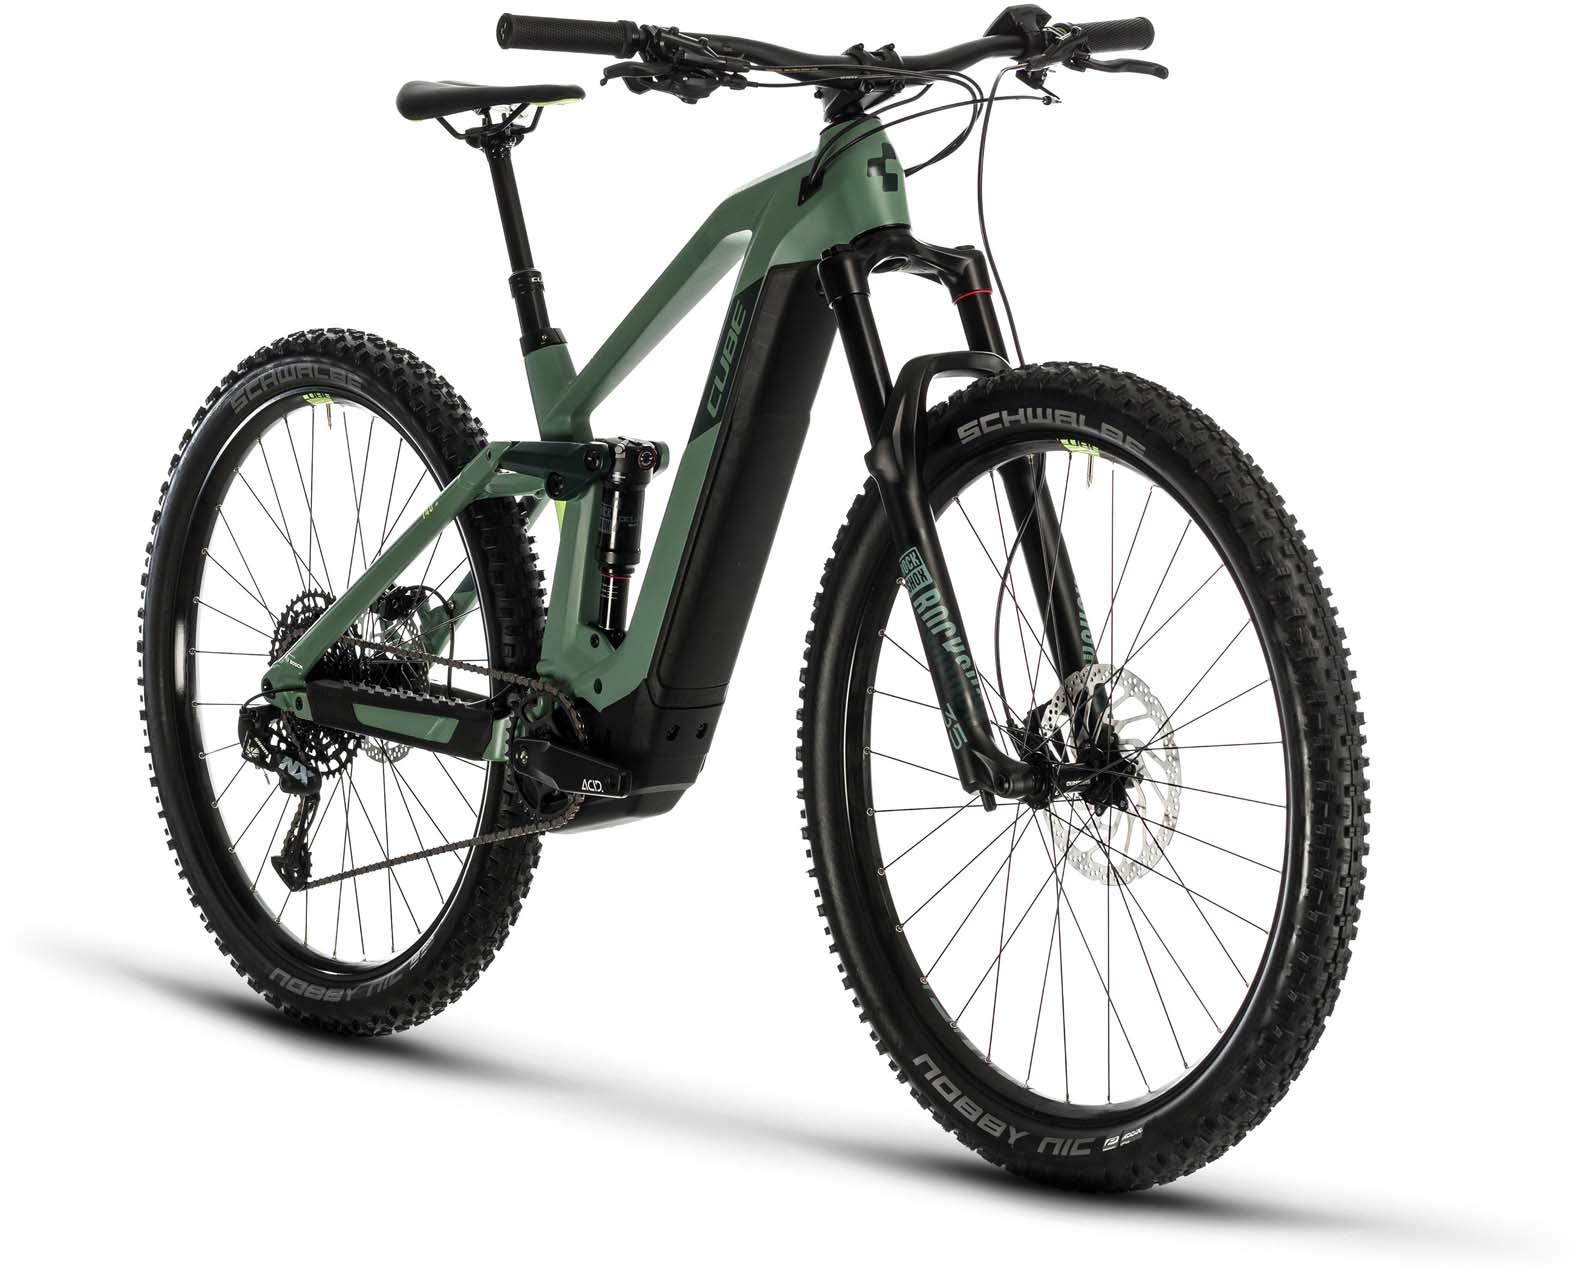 cube stereo hybrid 140 hpc race 625 29 green n sharpgreen 2020 e bike fully mountainbike cheap. Black Bedroom Furniture Sets. Home Design Ideas